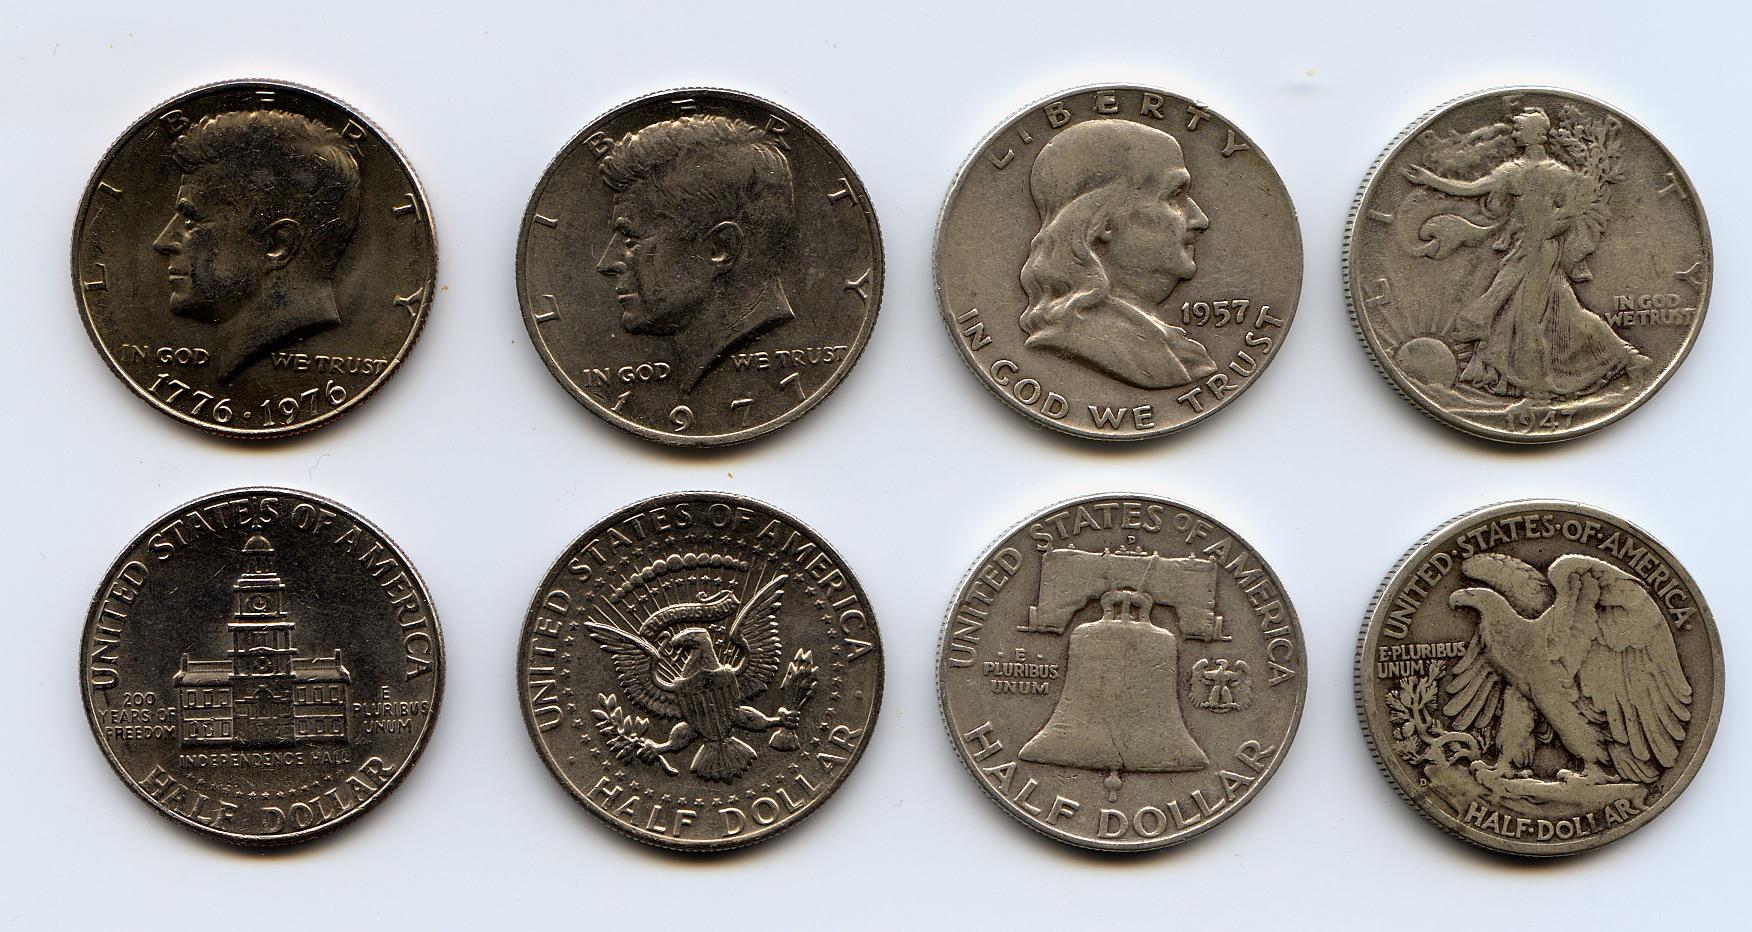 Half Dollar United States Coin